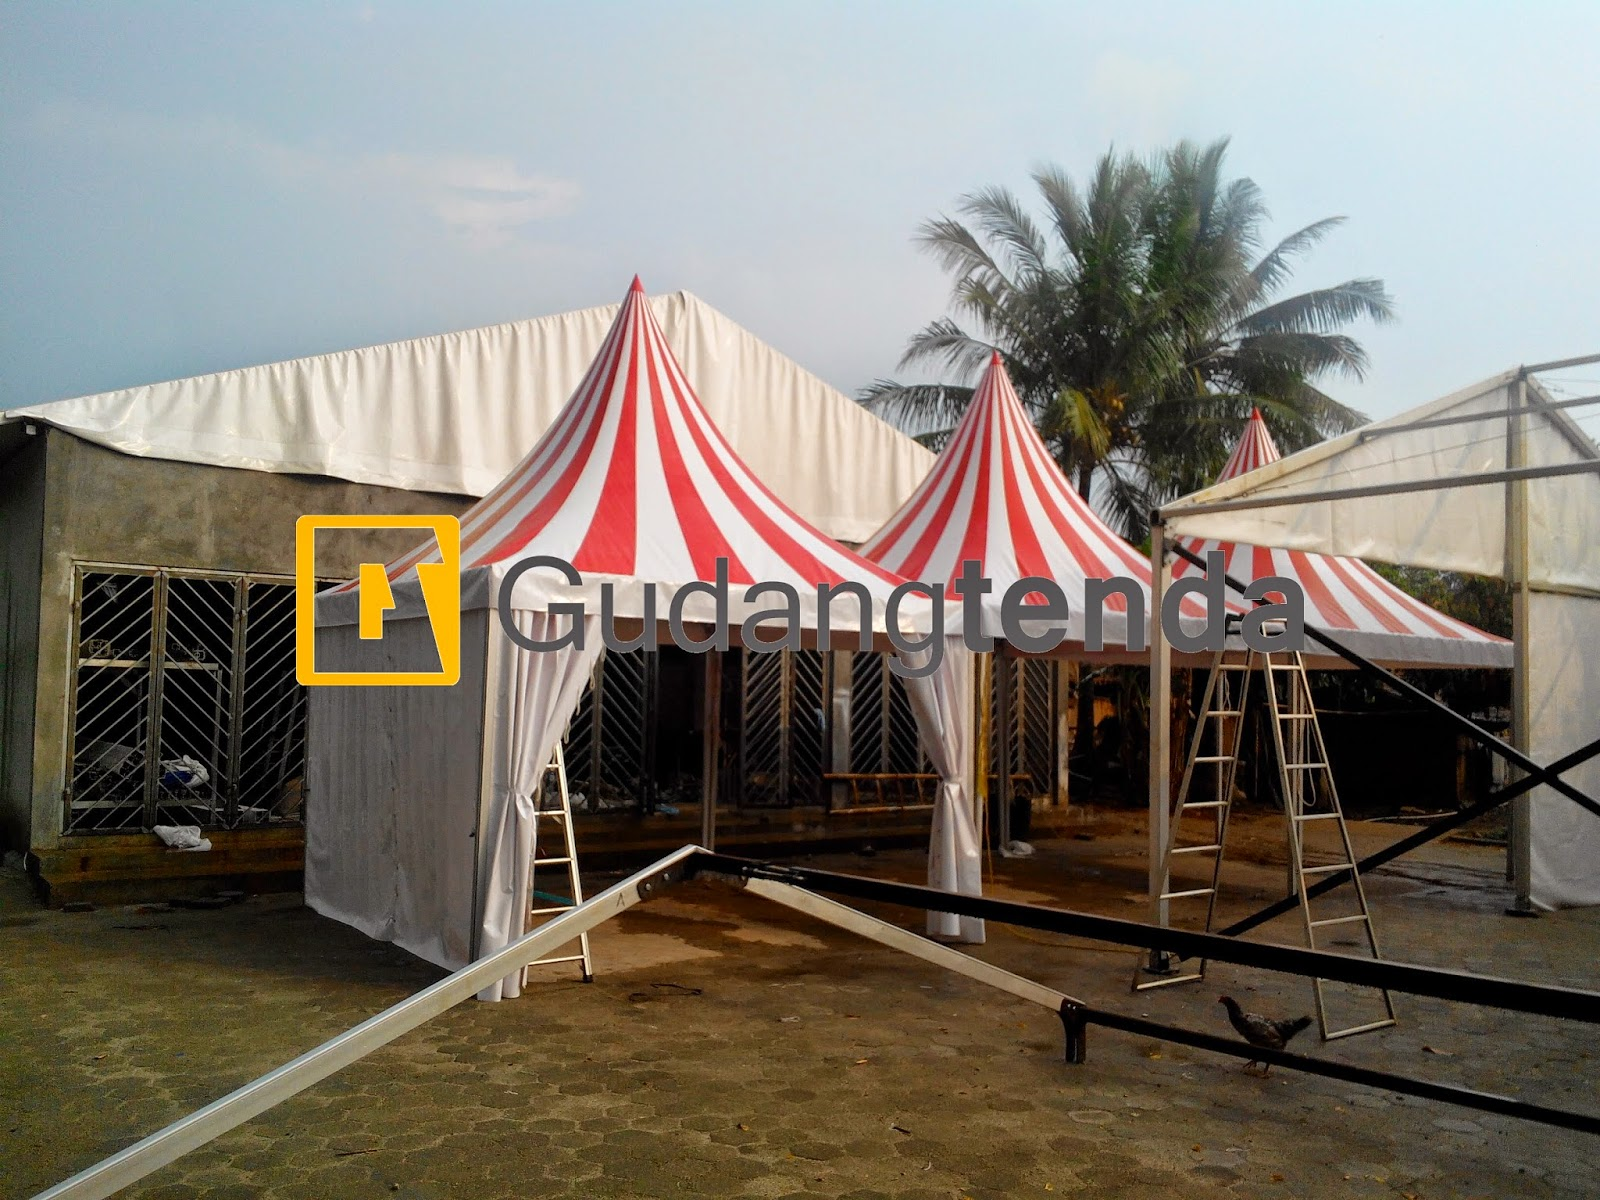 Pabrik Tenda Sarnafil, Pabrik Tenda, Jual tenda sirkus